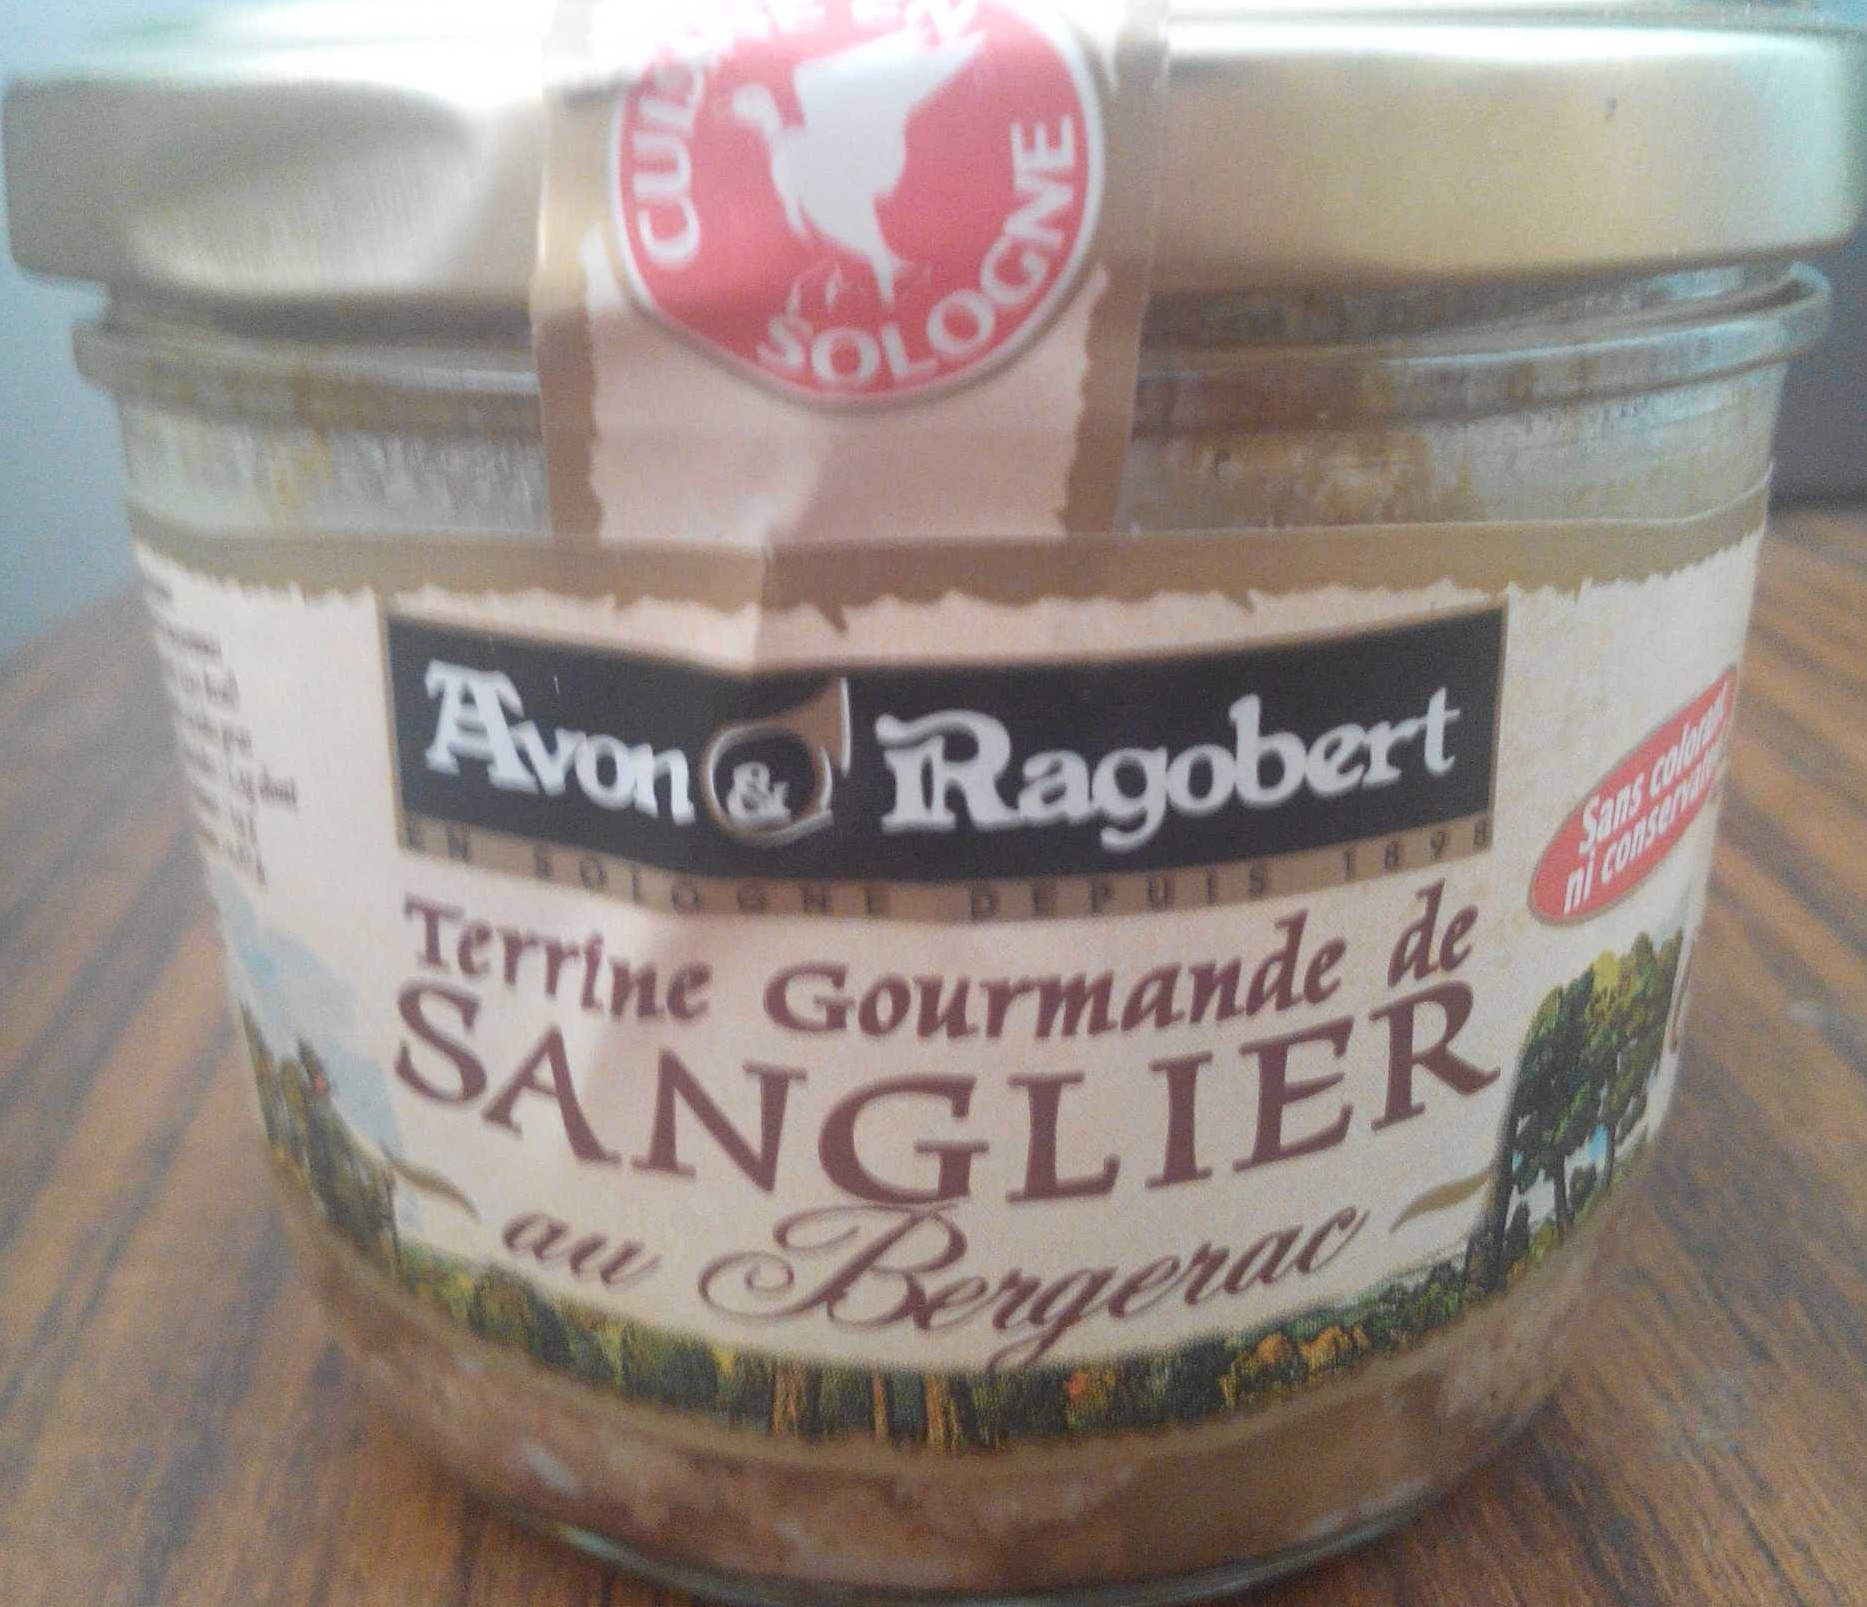 Terrine gourmande de sanglier au Bergerac - Produit